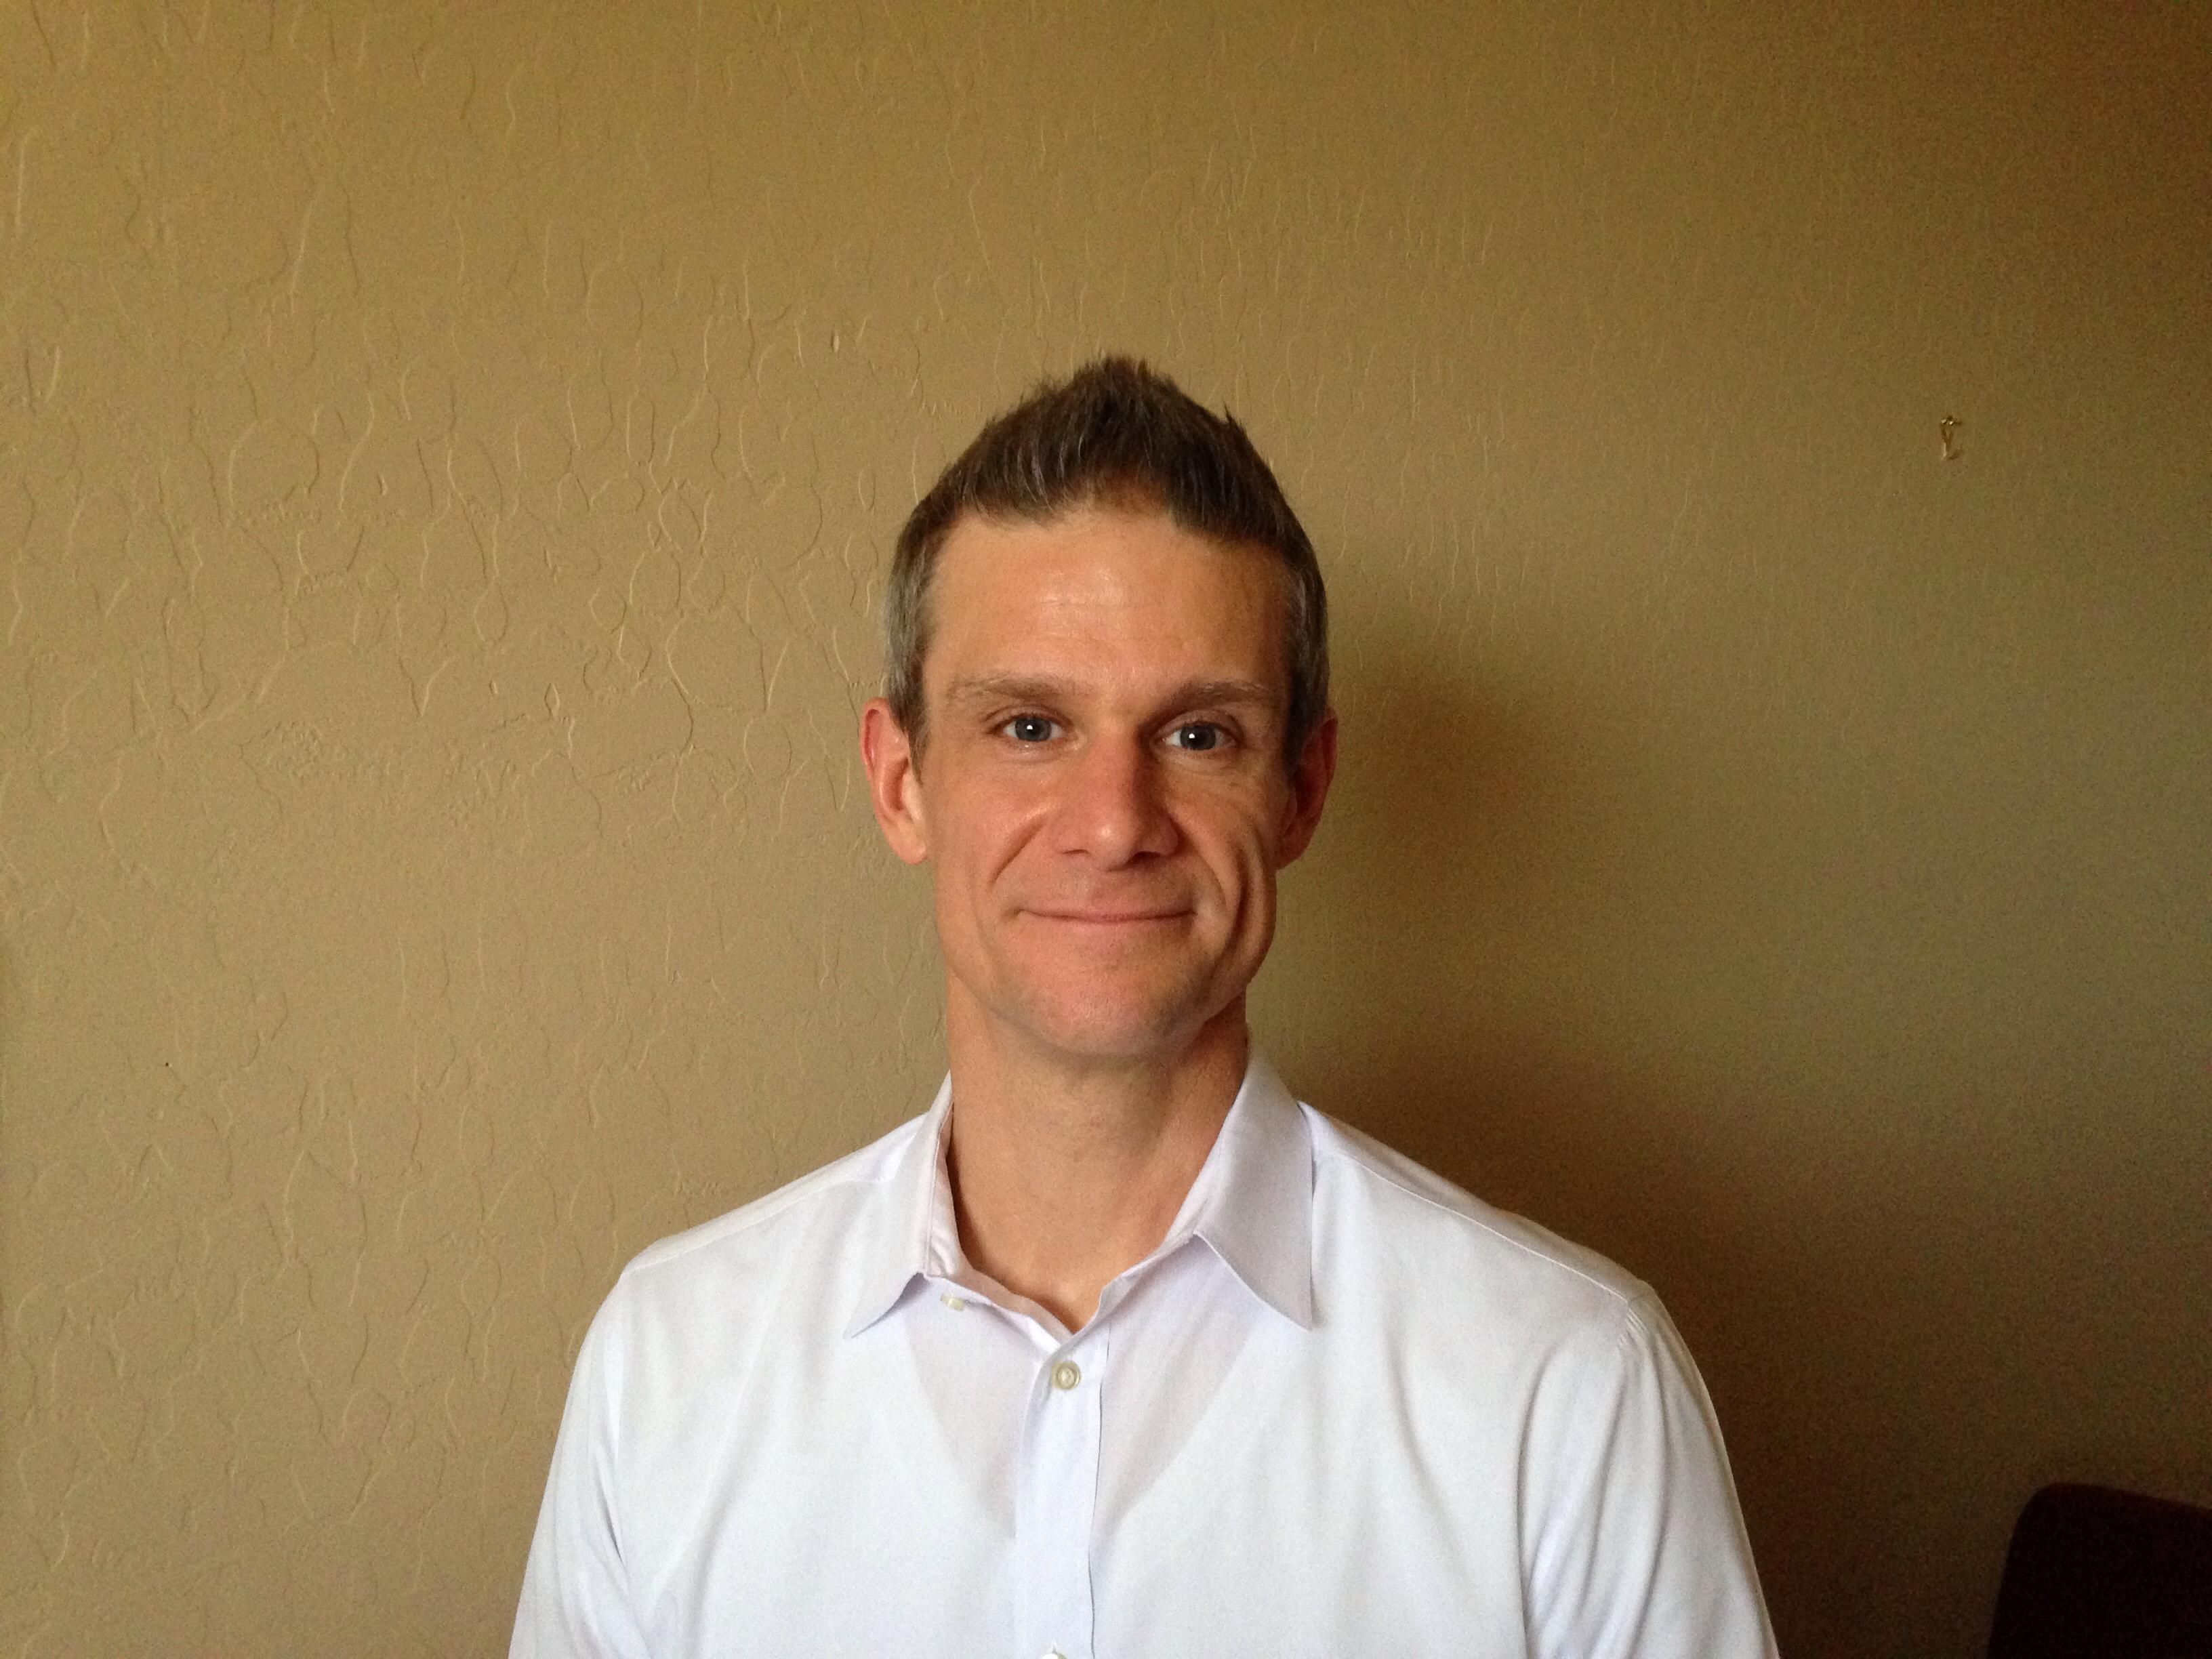 Andrew Klingman